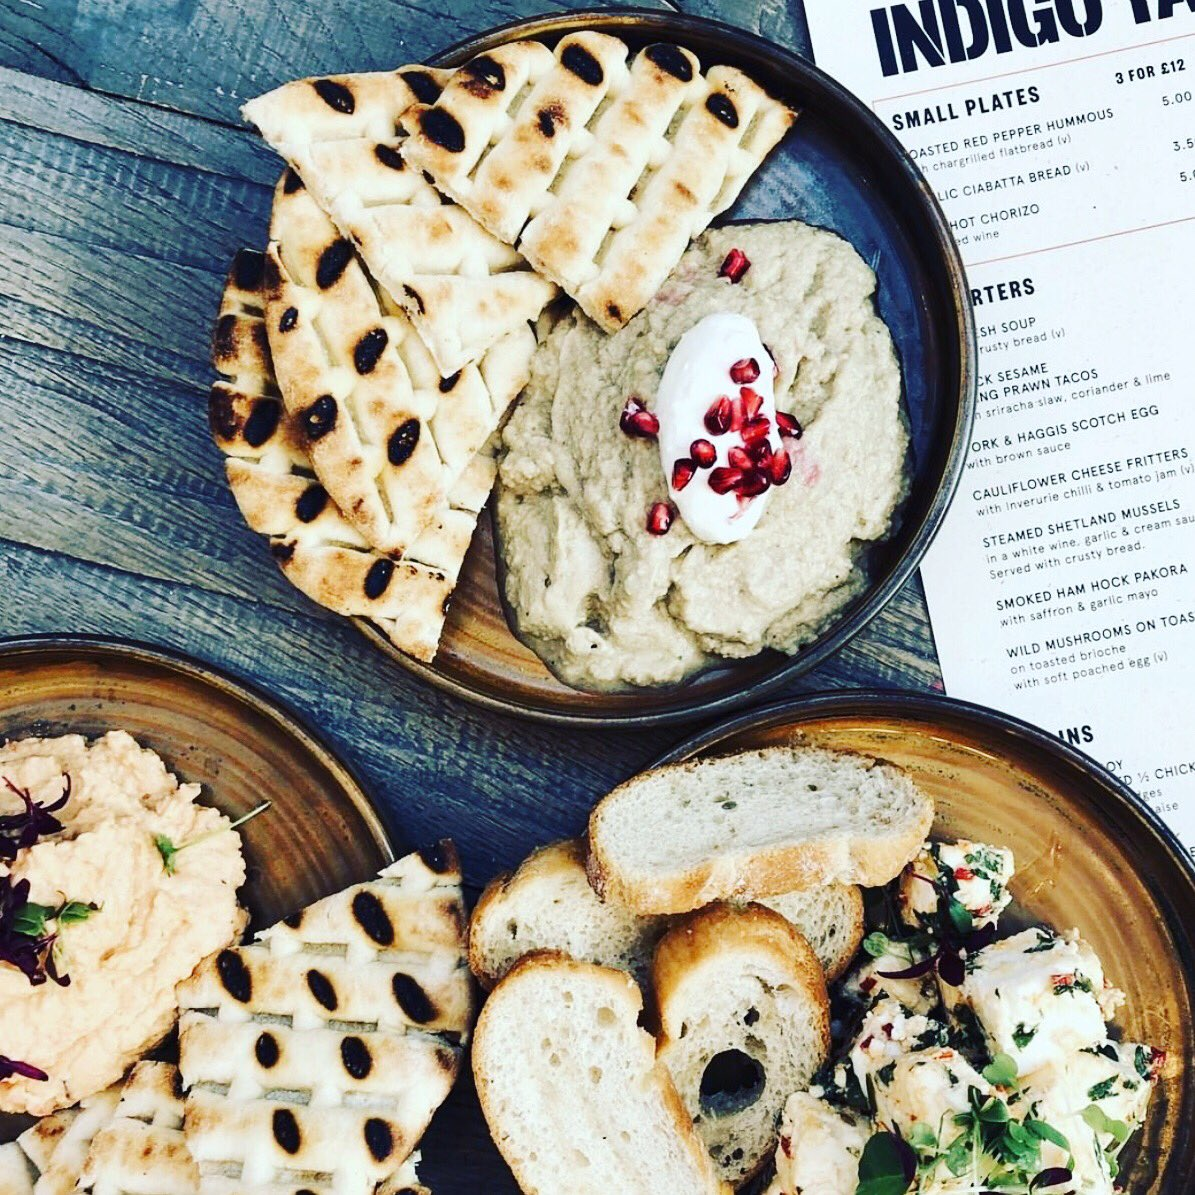 Sharing is caring 🍽👌🏻@IndigoYard sharing plates are three for £12!   #edinburghswestend #edinburgh #thisisedinburgh #edinburghlife #edinburghfoodie #edinburghcity #visitscotland #scotland